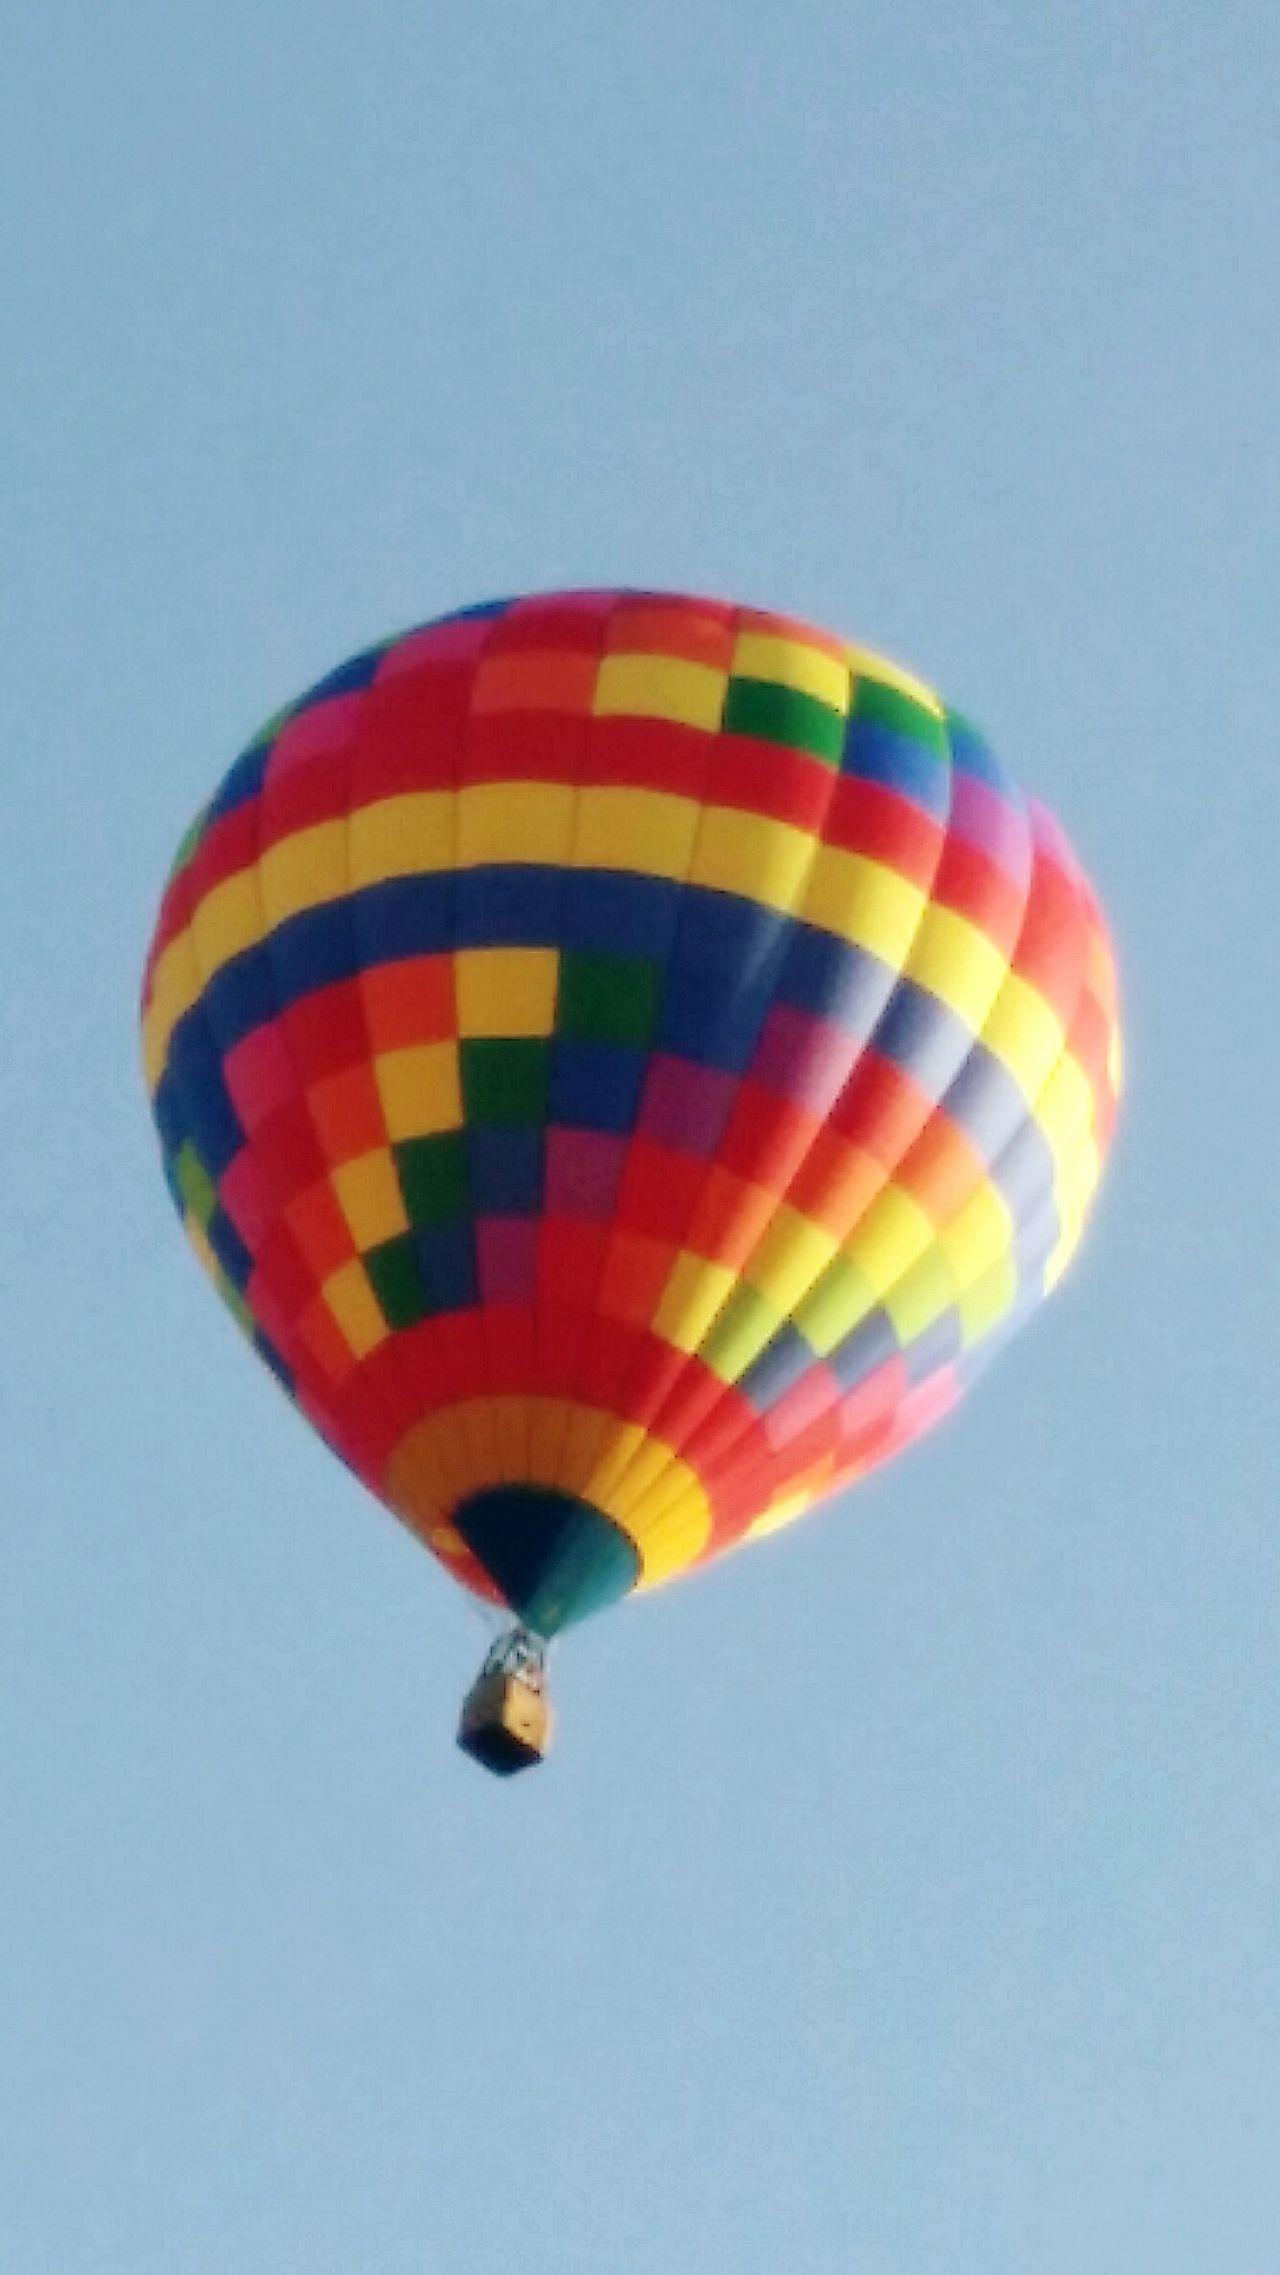 Helen balloon festival Summertime Hot Air Balloon Festival Taking Photos Check This Out